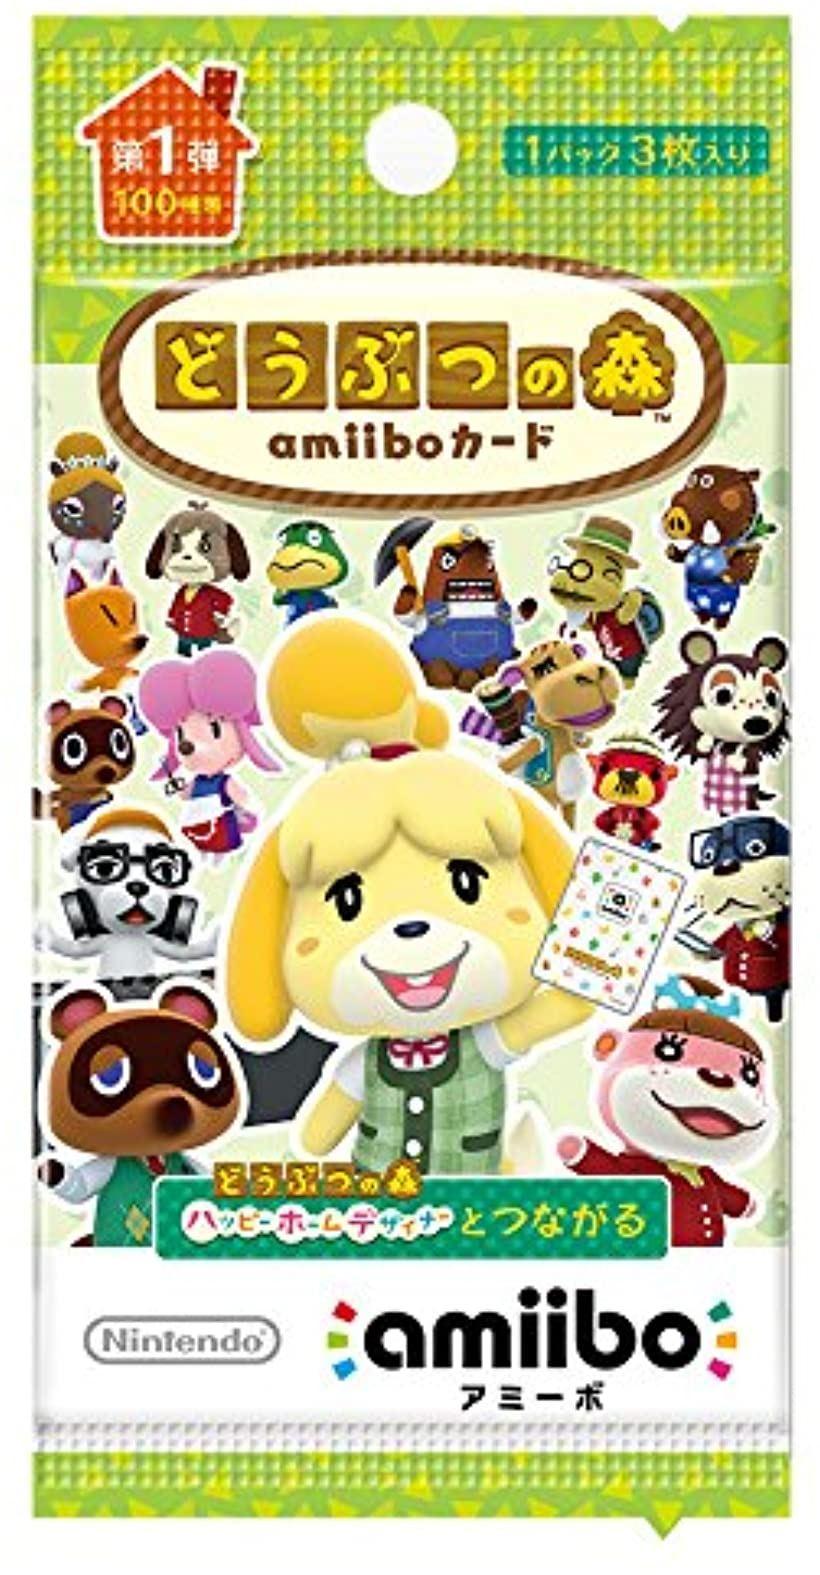 Nintendo 3DS・2DS, 周辺機器 amiibo 1 54969123700289(Nintendo 3DS)